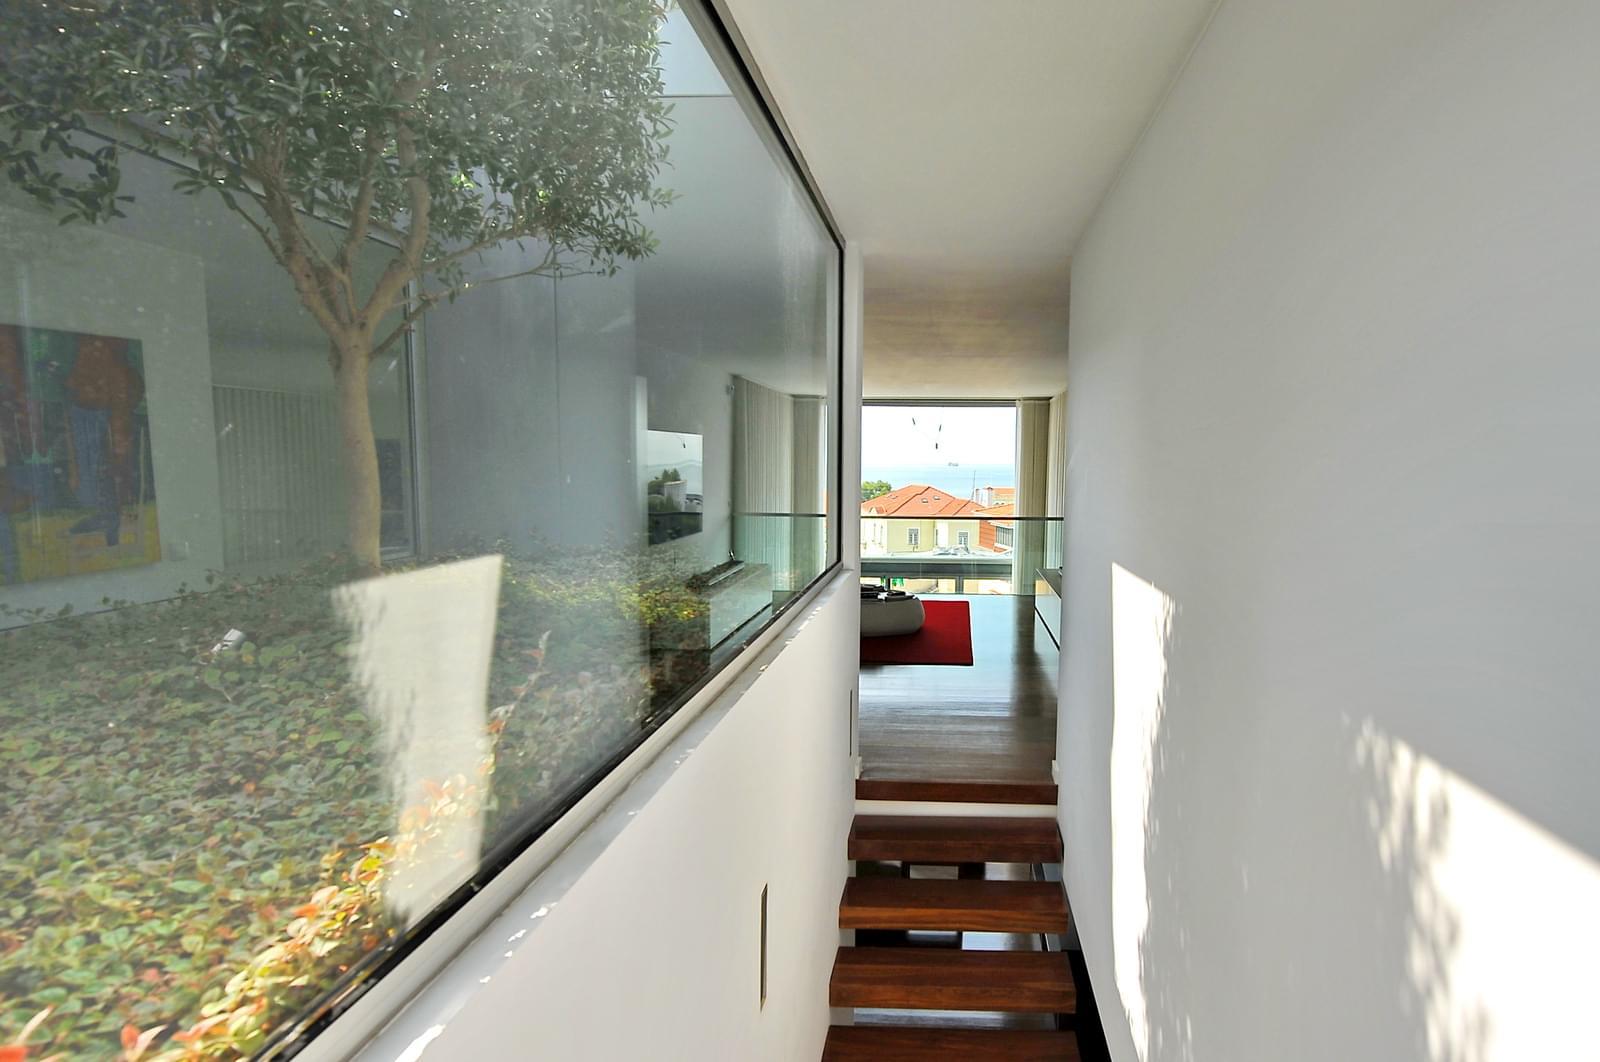 pf17631-apartamento-t5-cascais-6205a425-30a1-45e4-a374-ca67b9786d7d